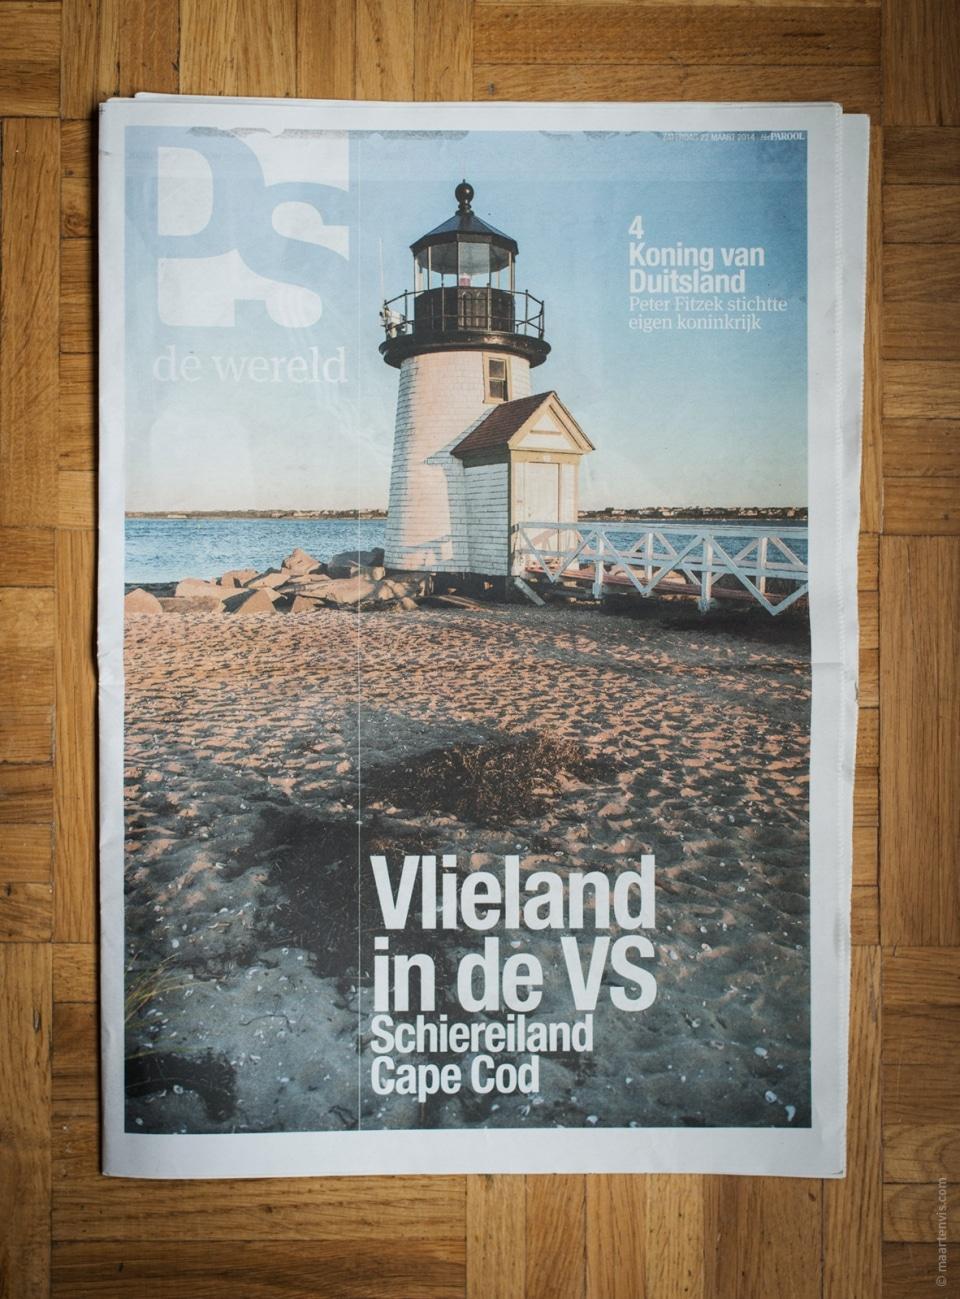 20140627 14211 960x1299 - Cape Cod / Nantucket Publication in Het Parool